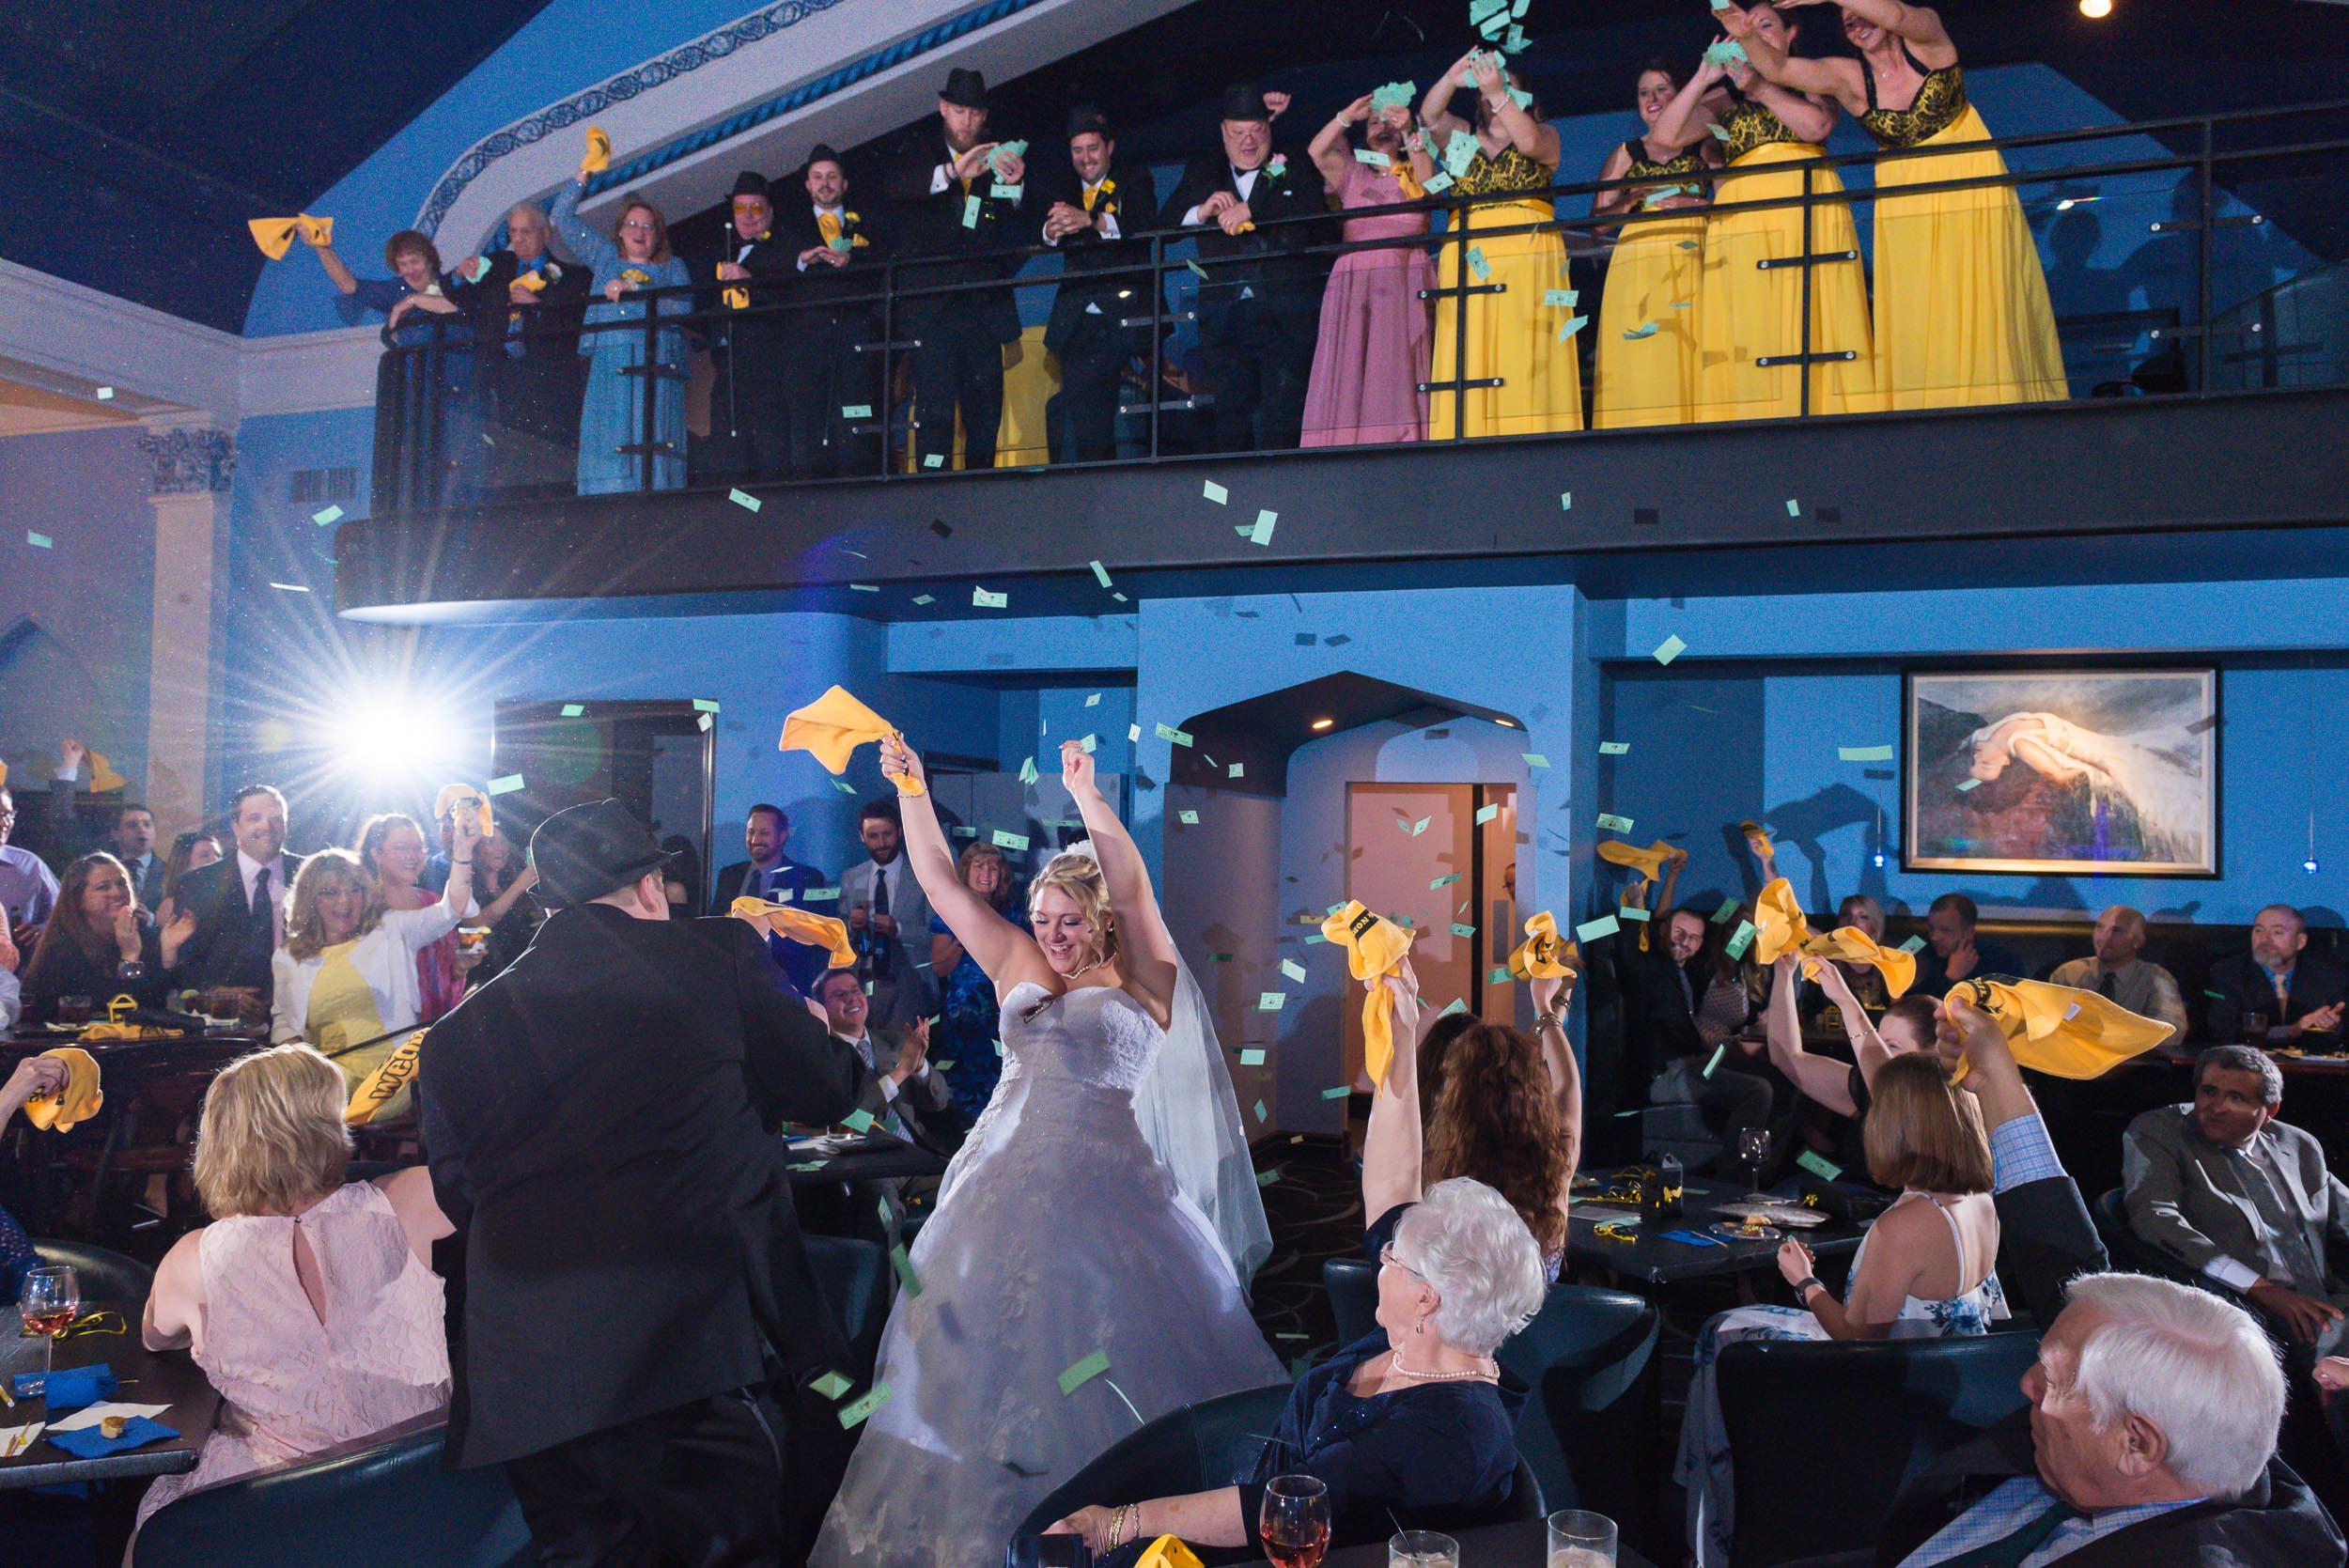 Wedding-Reception-Cefelos-Banquet-Event-Center-1.jpg